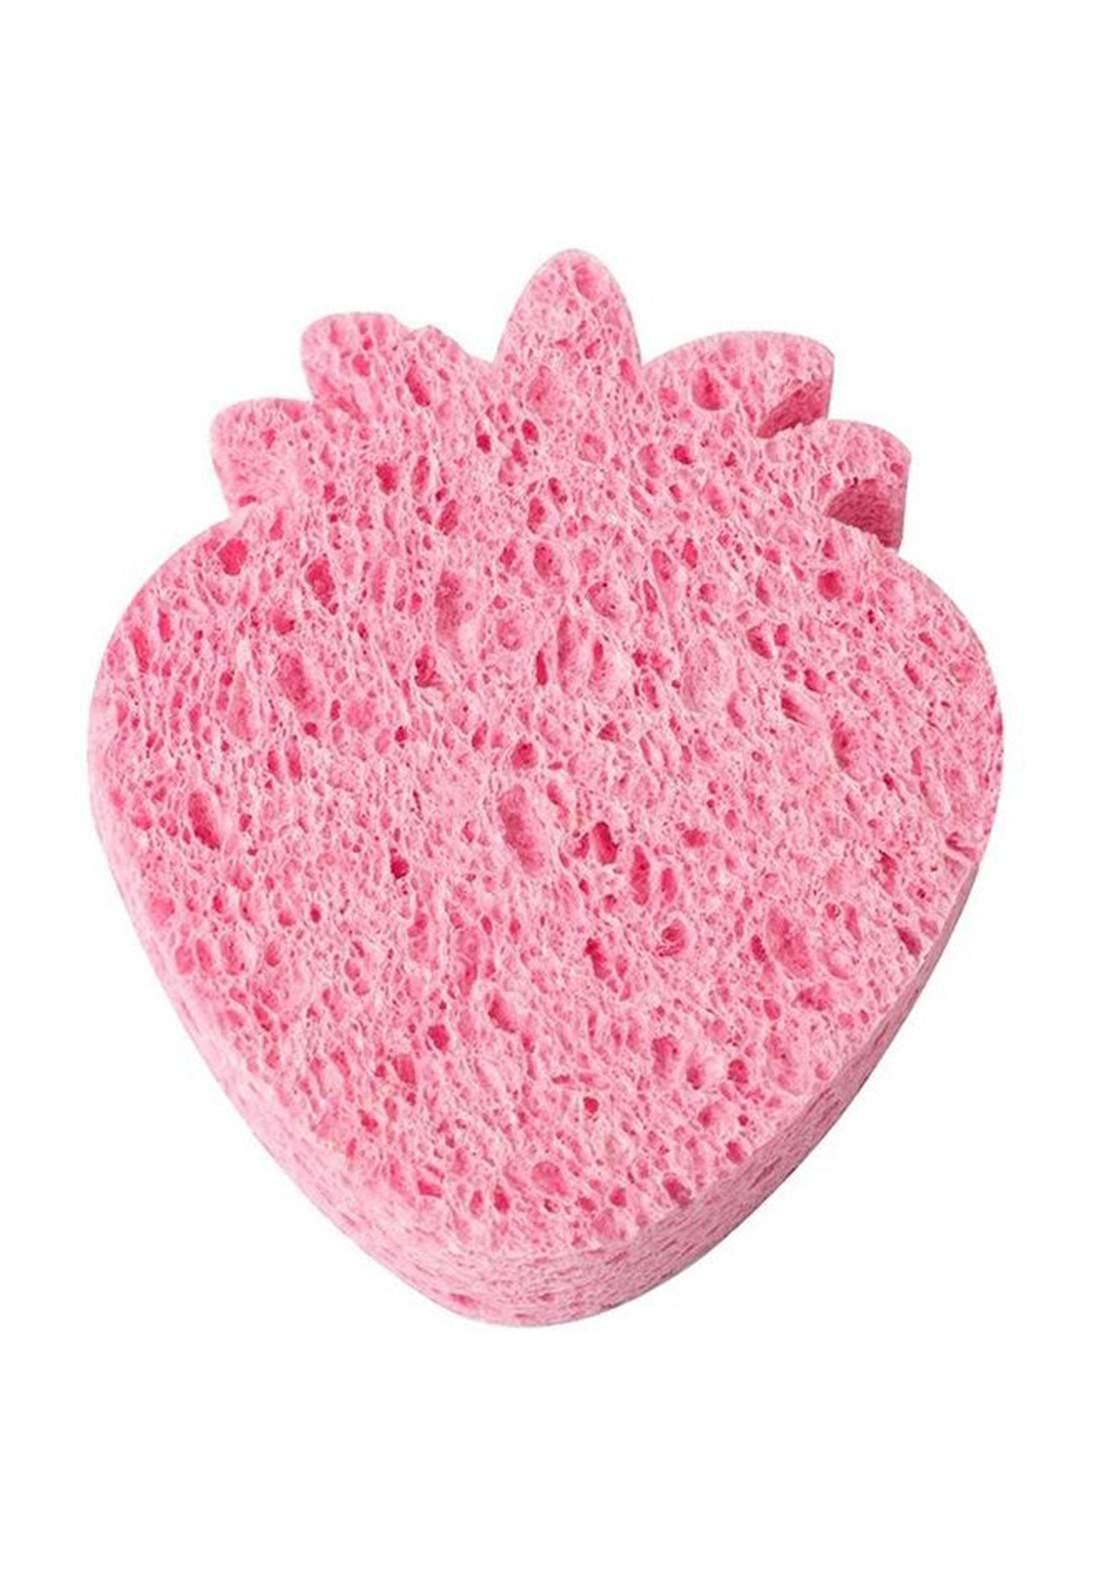 Wee Baby 915 Strawberry Cellulose Bath Sponge اسفنجة استحمام سليلوزية